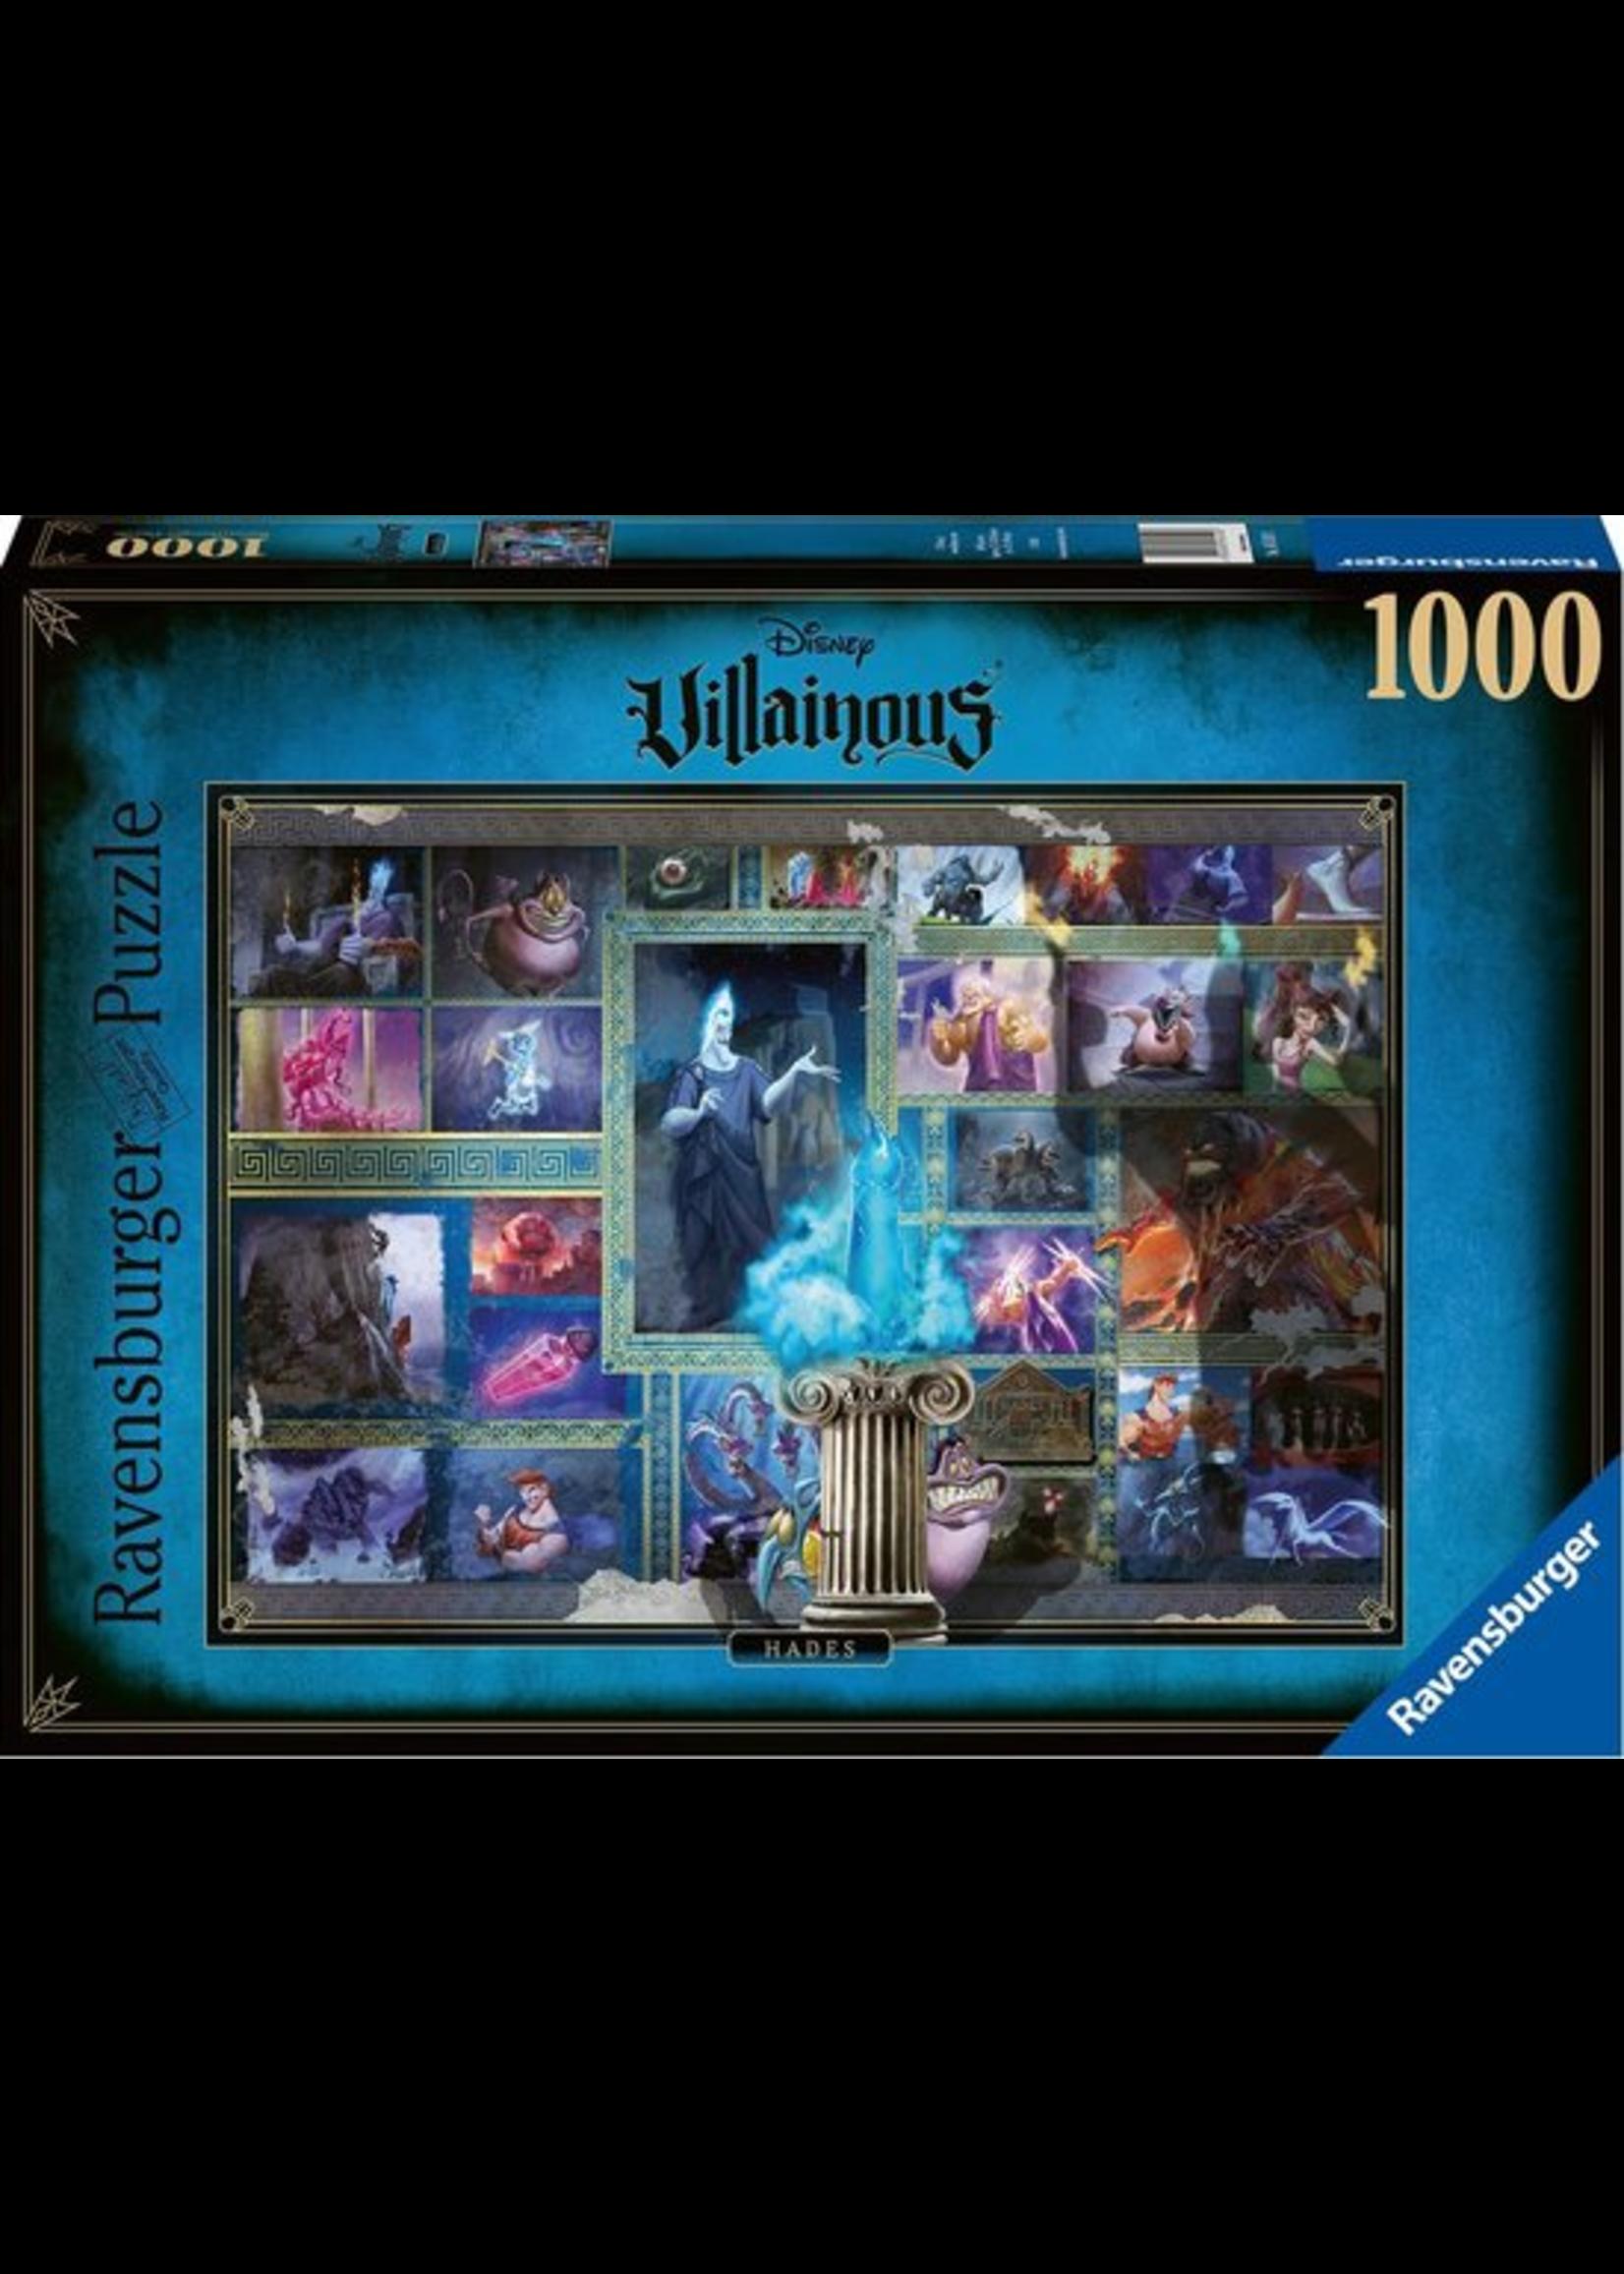 Disney Villainous - Hades (1000)